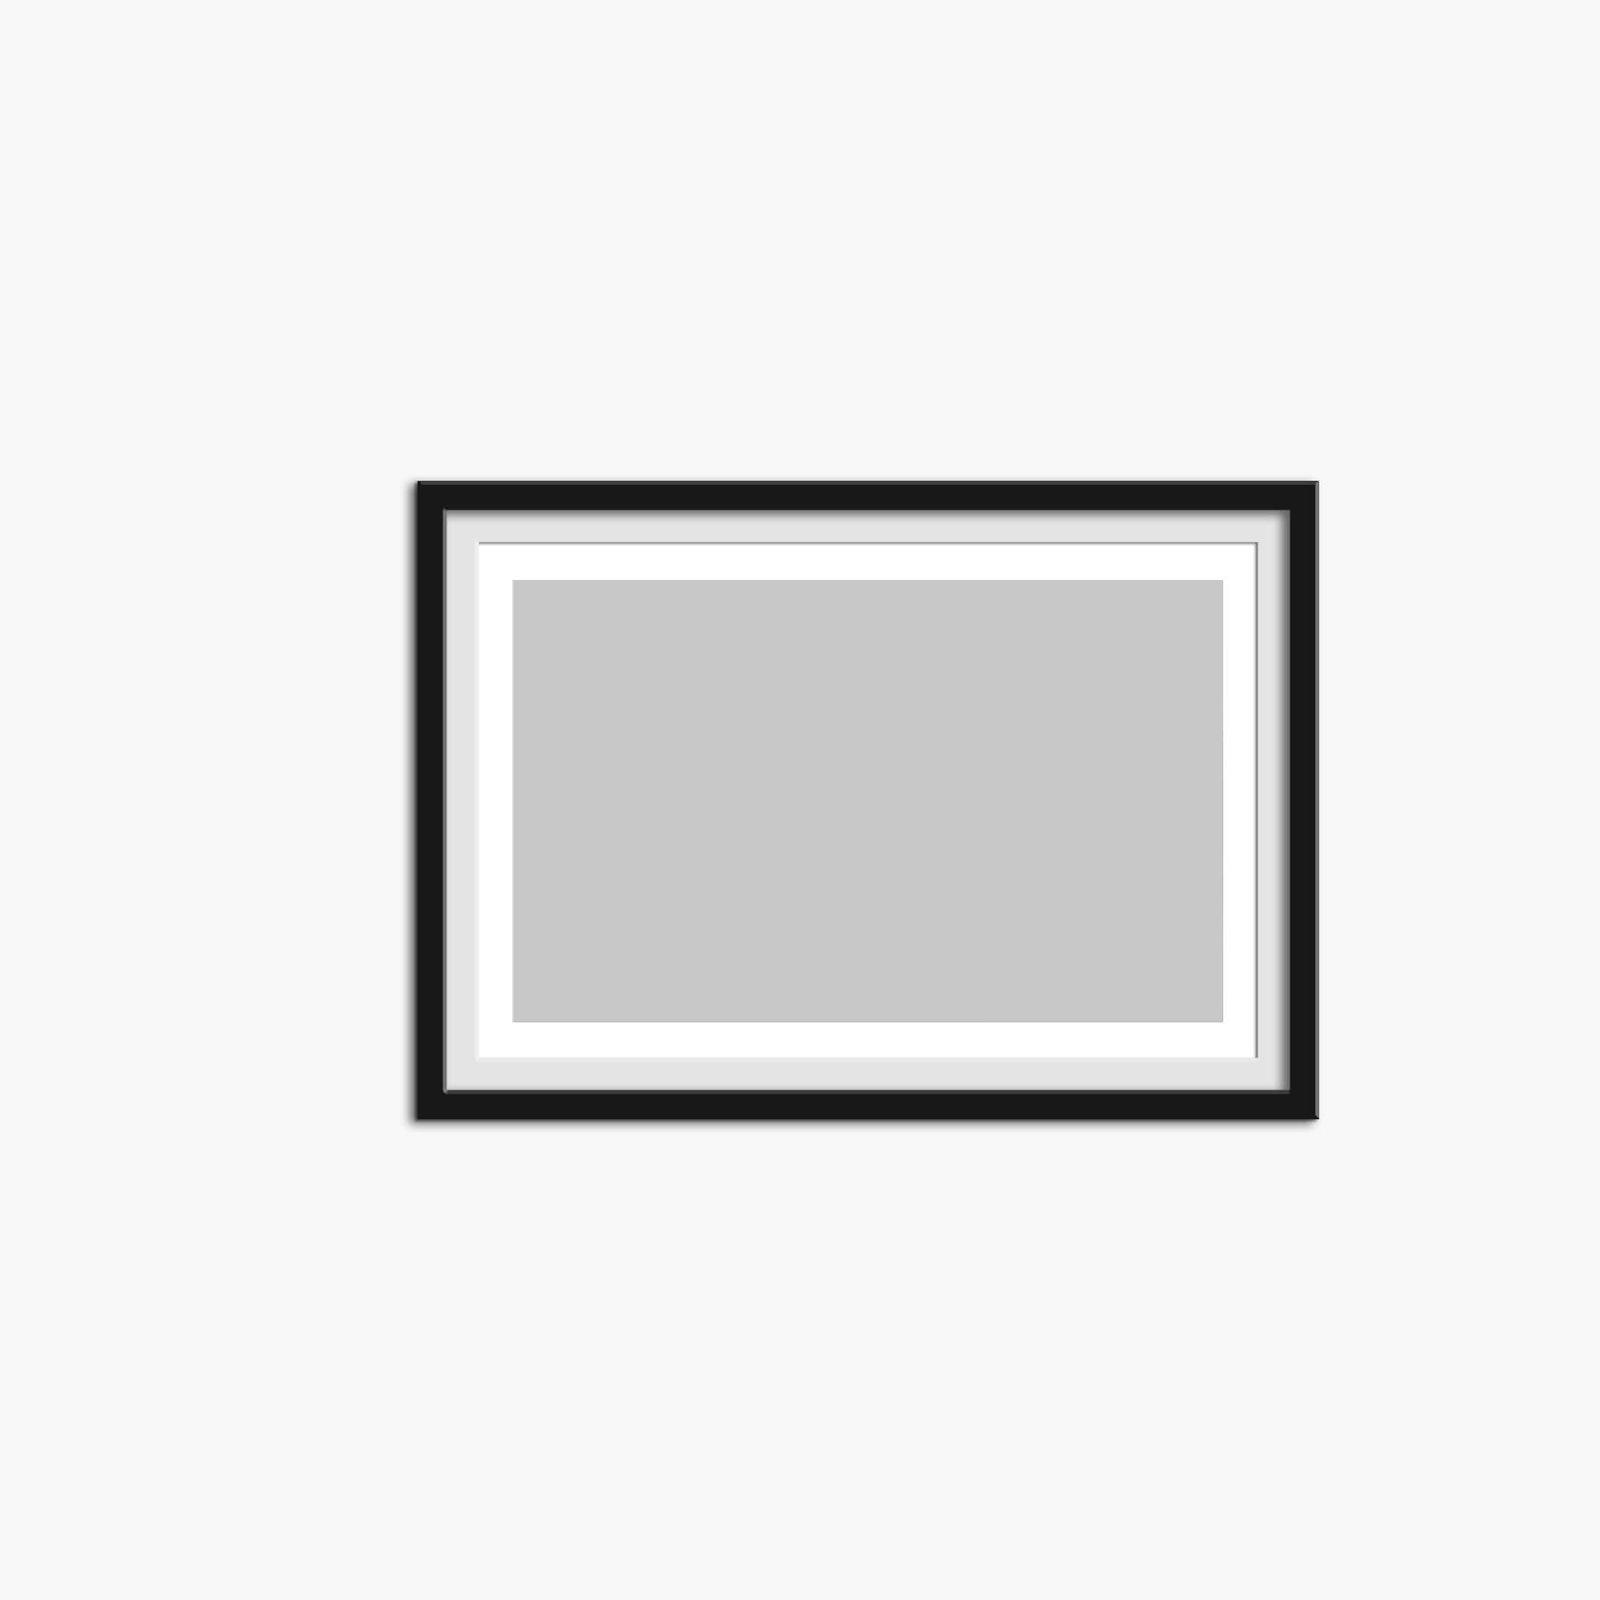 Blank Free Landscape Frame Mockup PSD Template